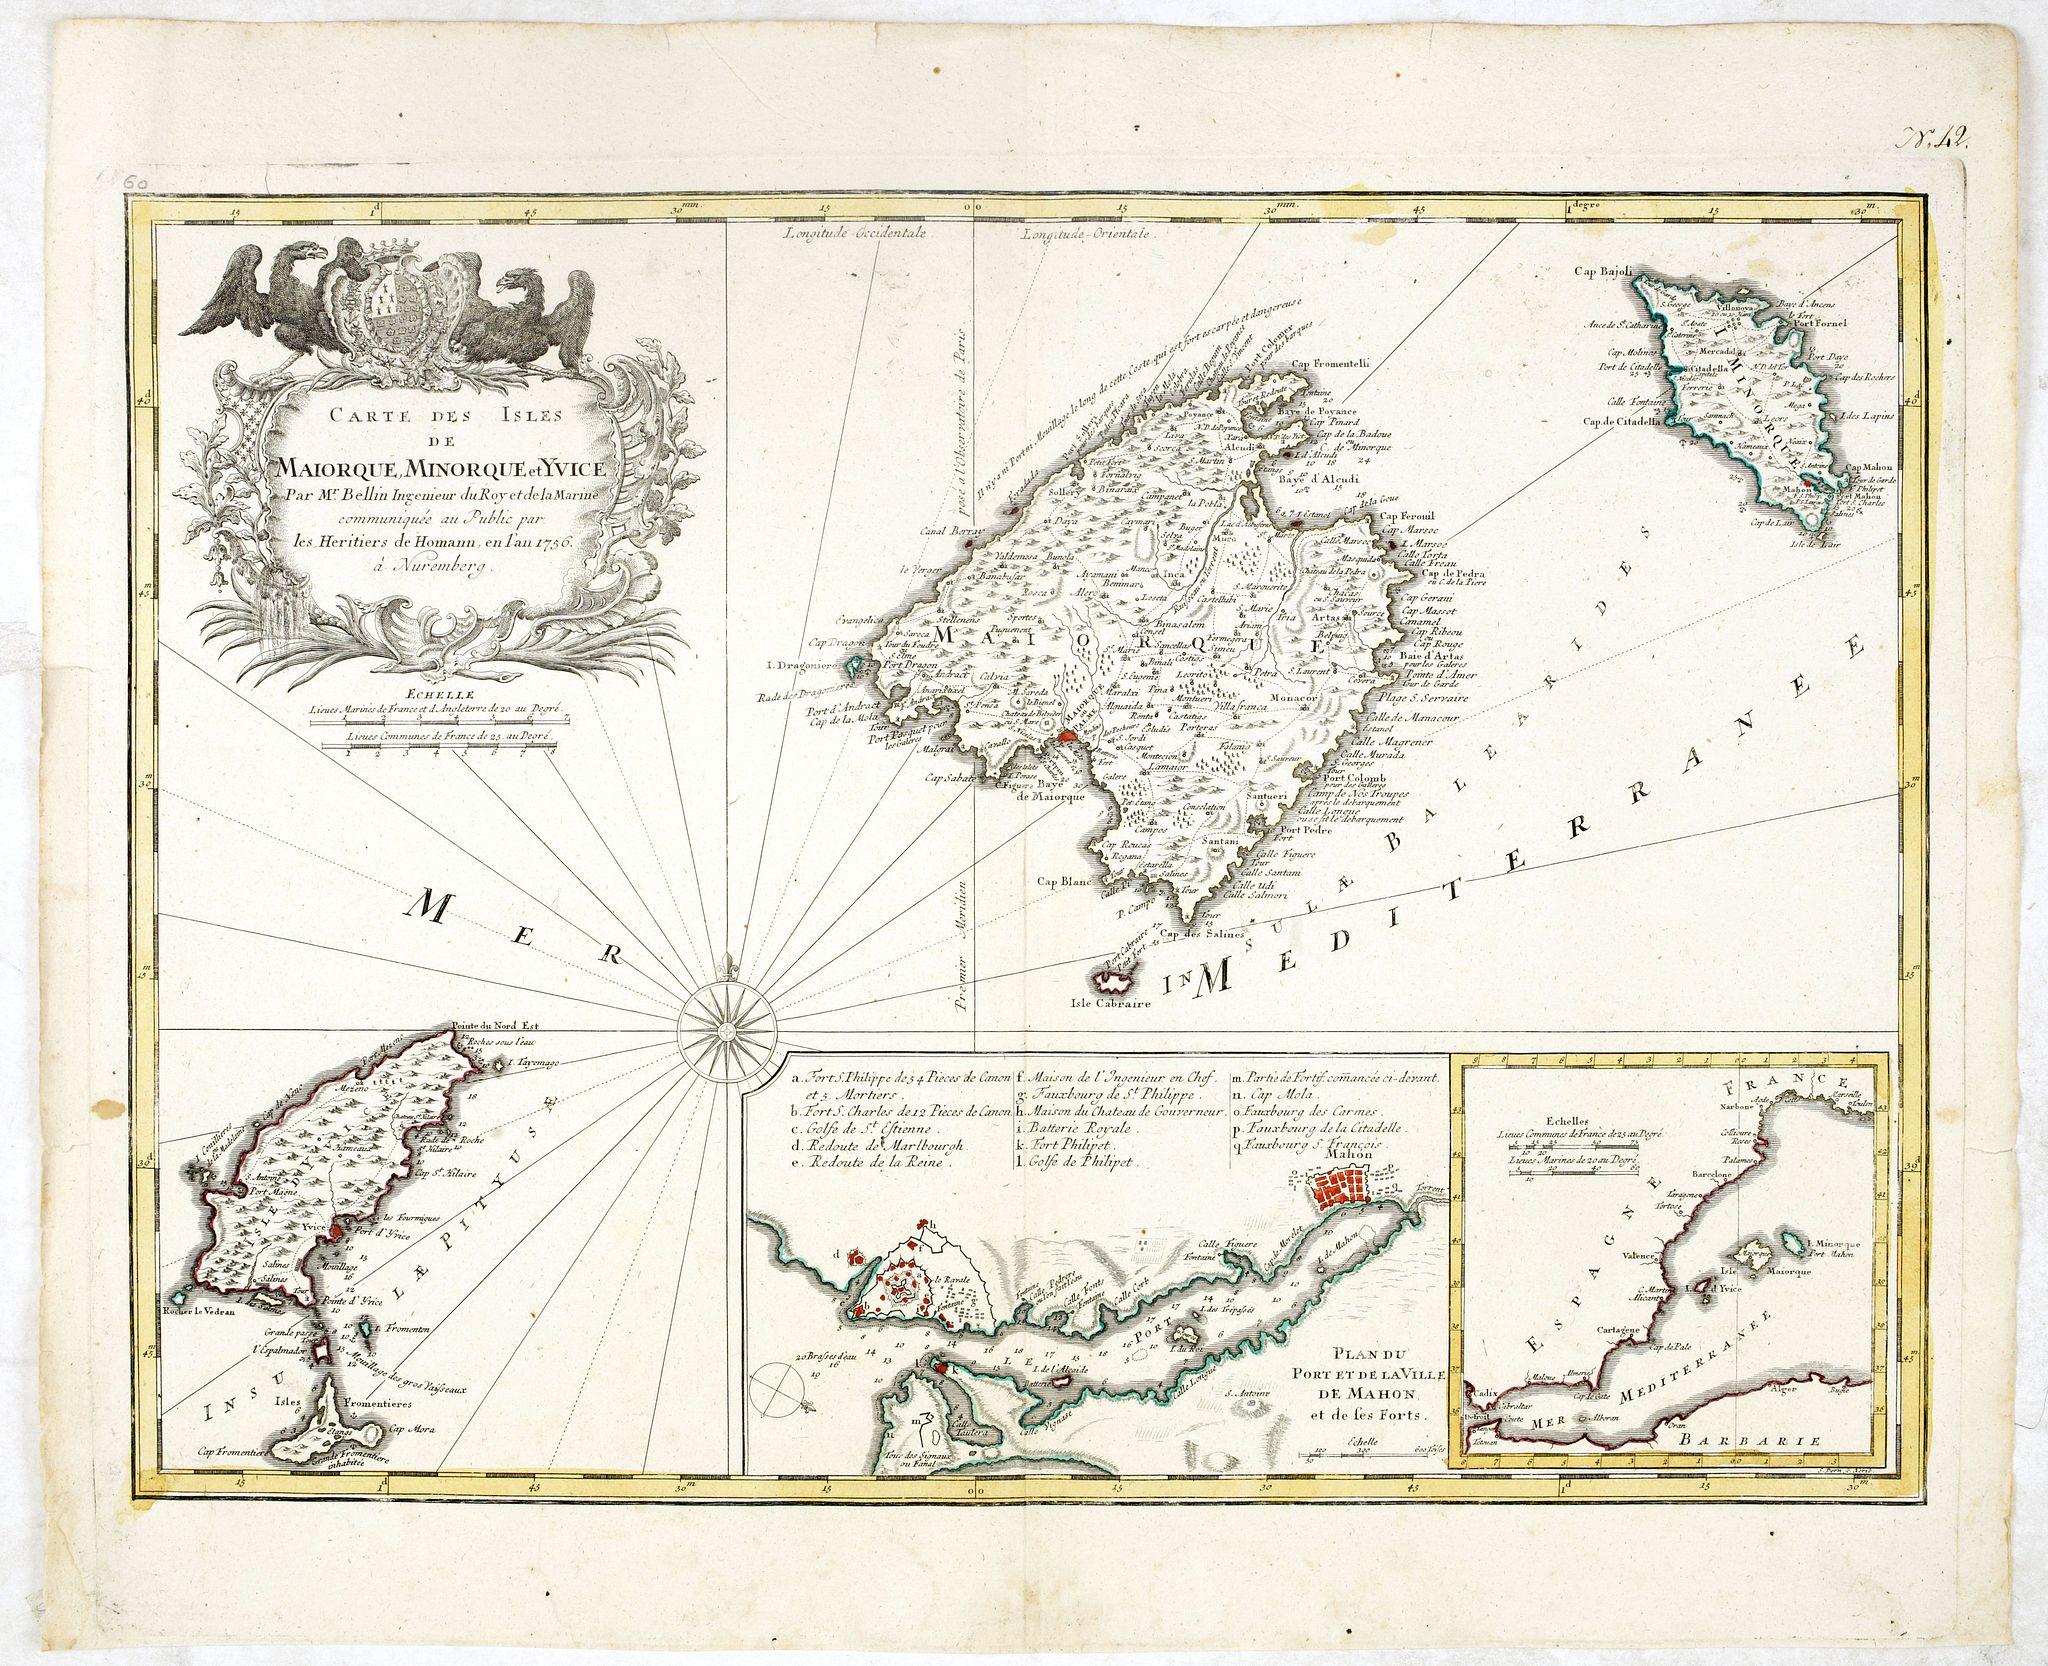 BELLIN, J.N. / HOMANN HEIRS -  Carte des Isles de Maiorque Minorque et Yvice.